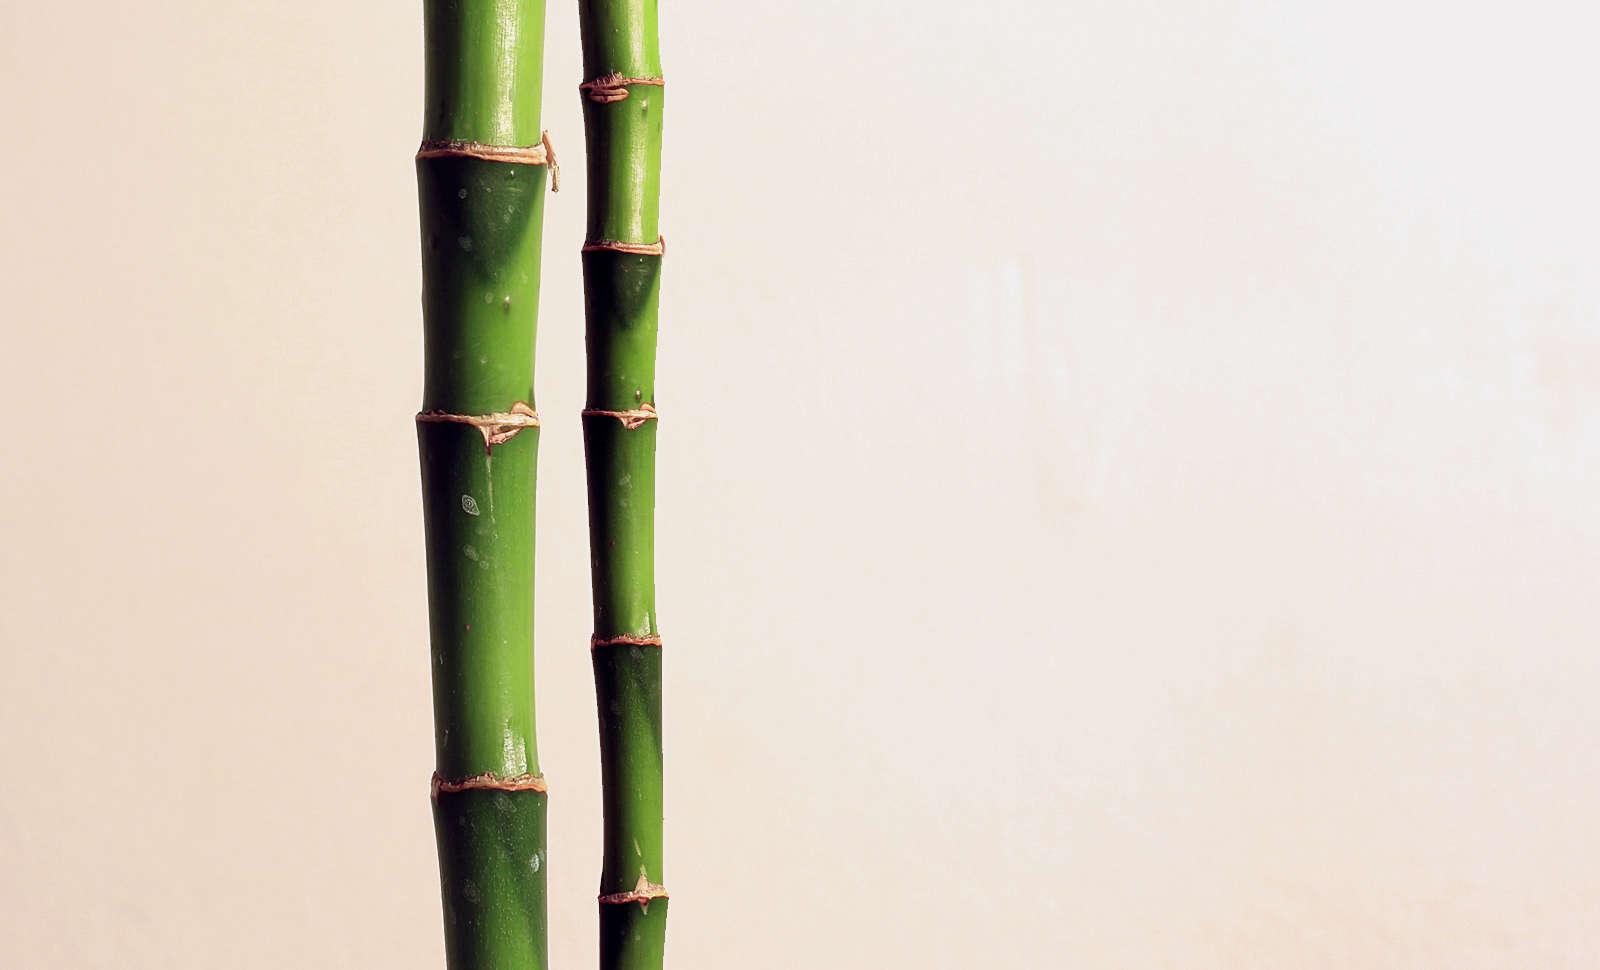 Lucky Bamboo stalk Photo by Gabriel Caparo